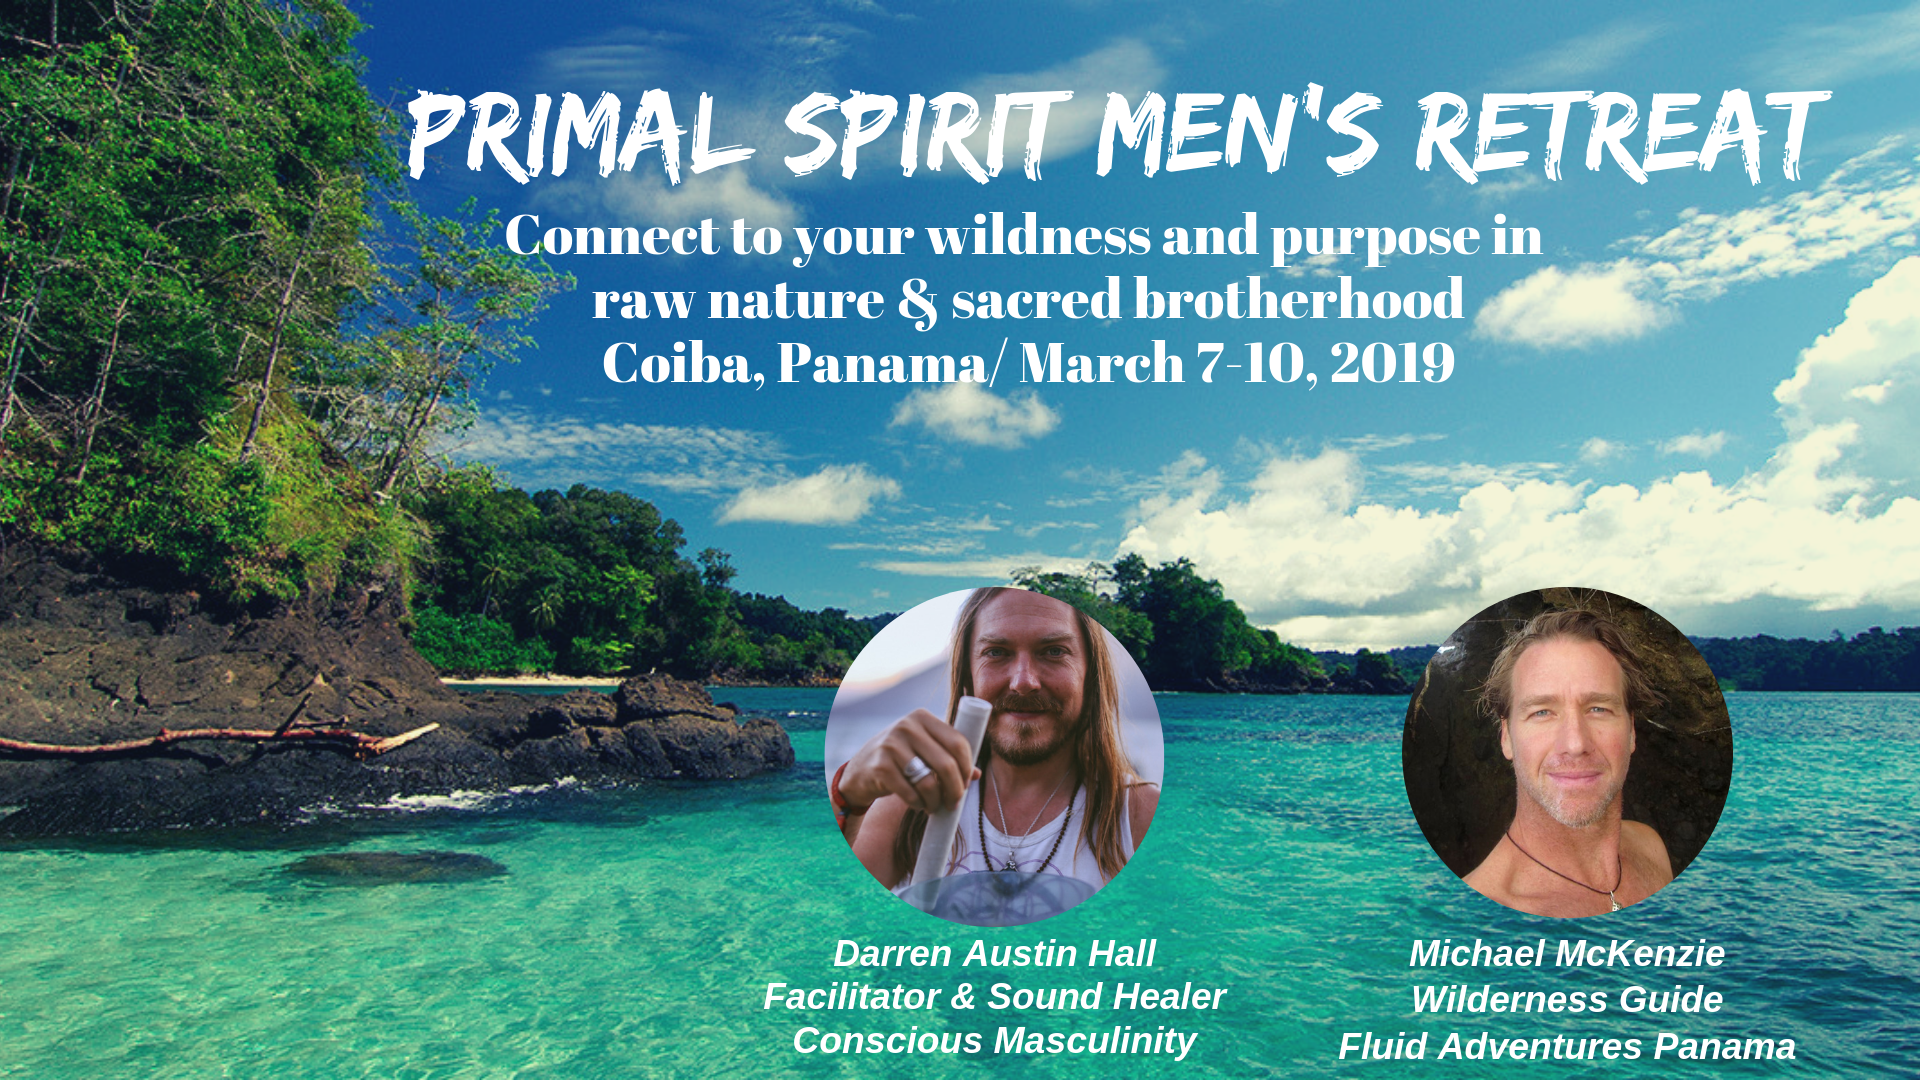 PRIMAL SPIRIT MEN'S RETREAT (1).png